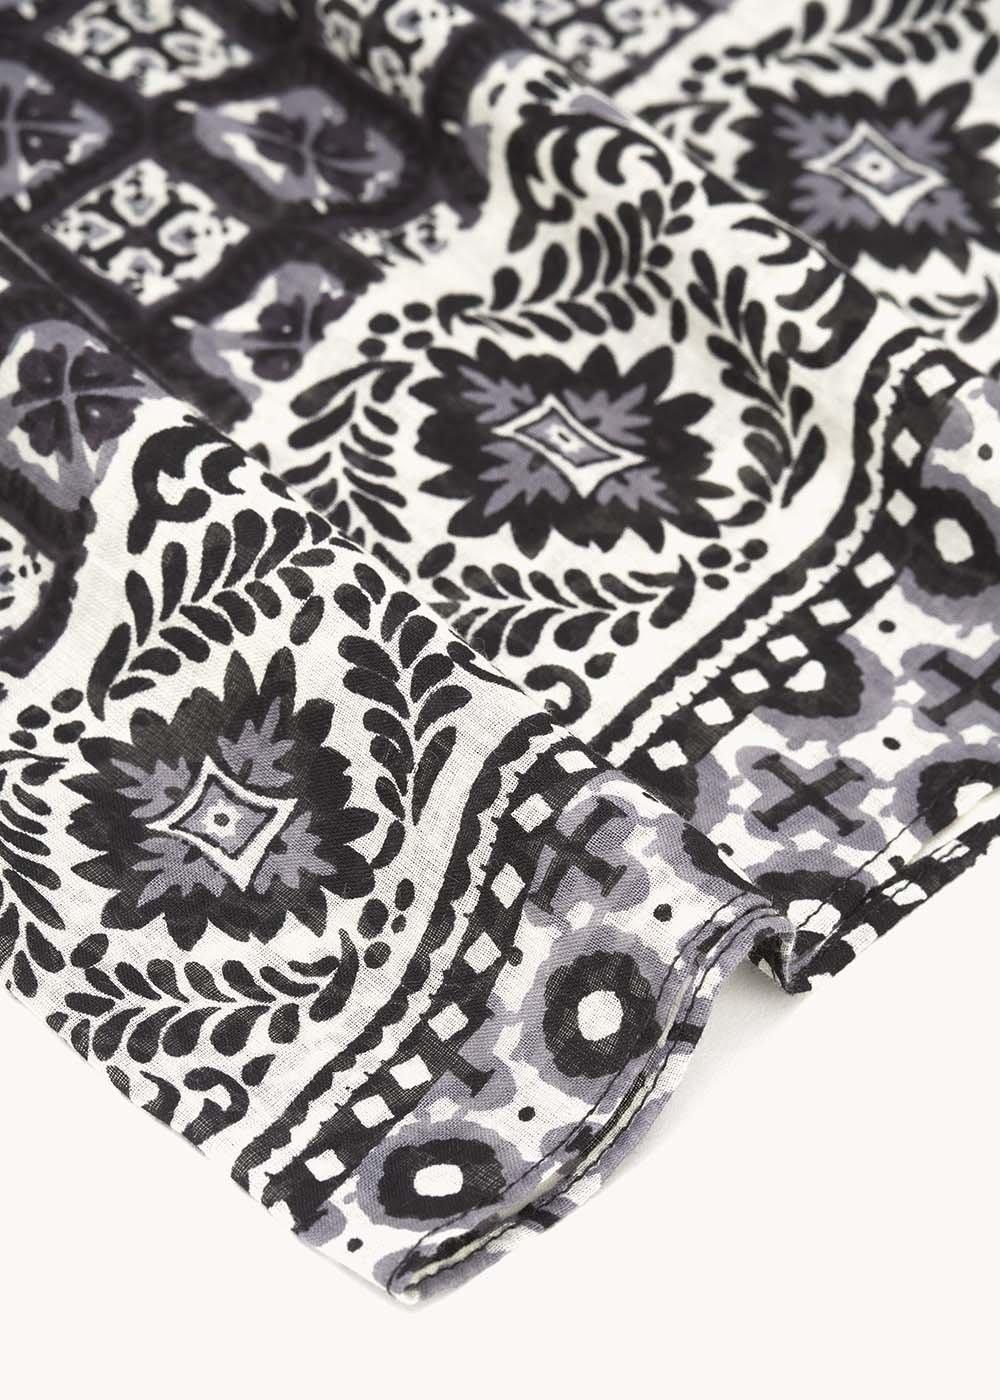 Seraph scarf with majolica print - Smocky / White Fantasia - Woman